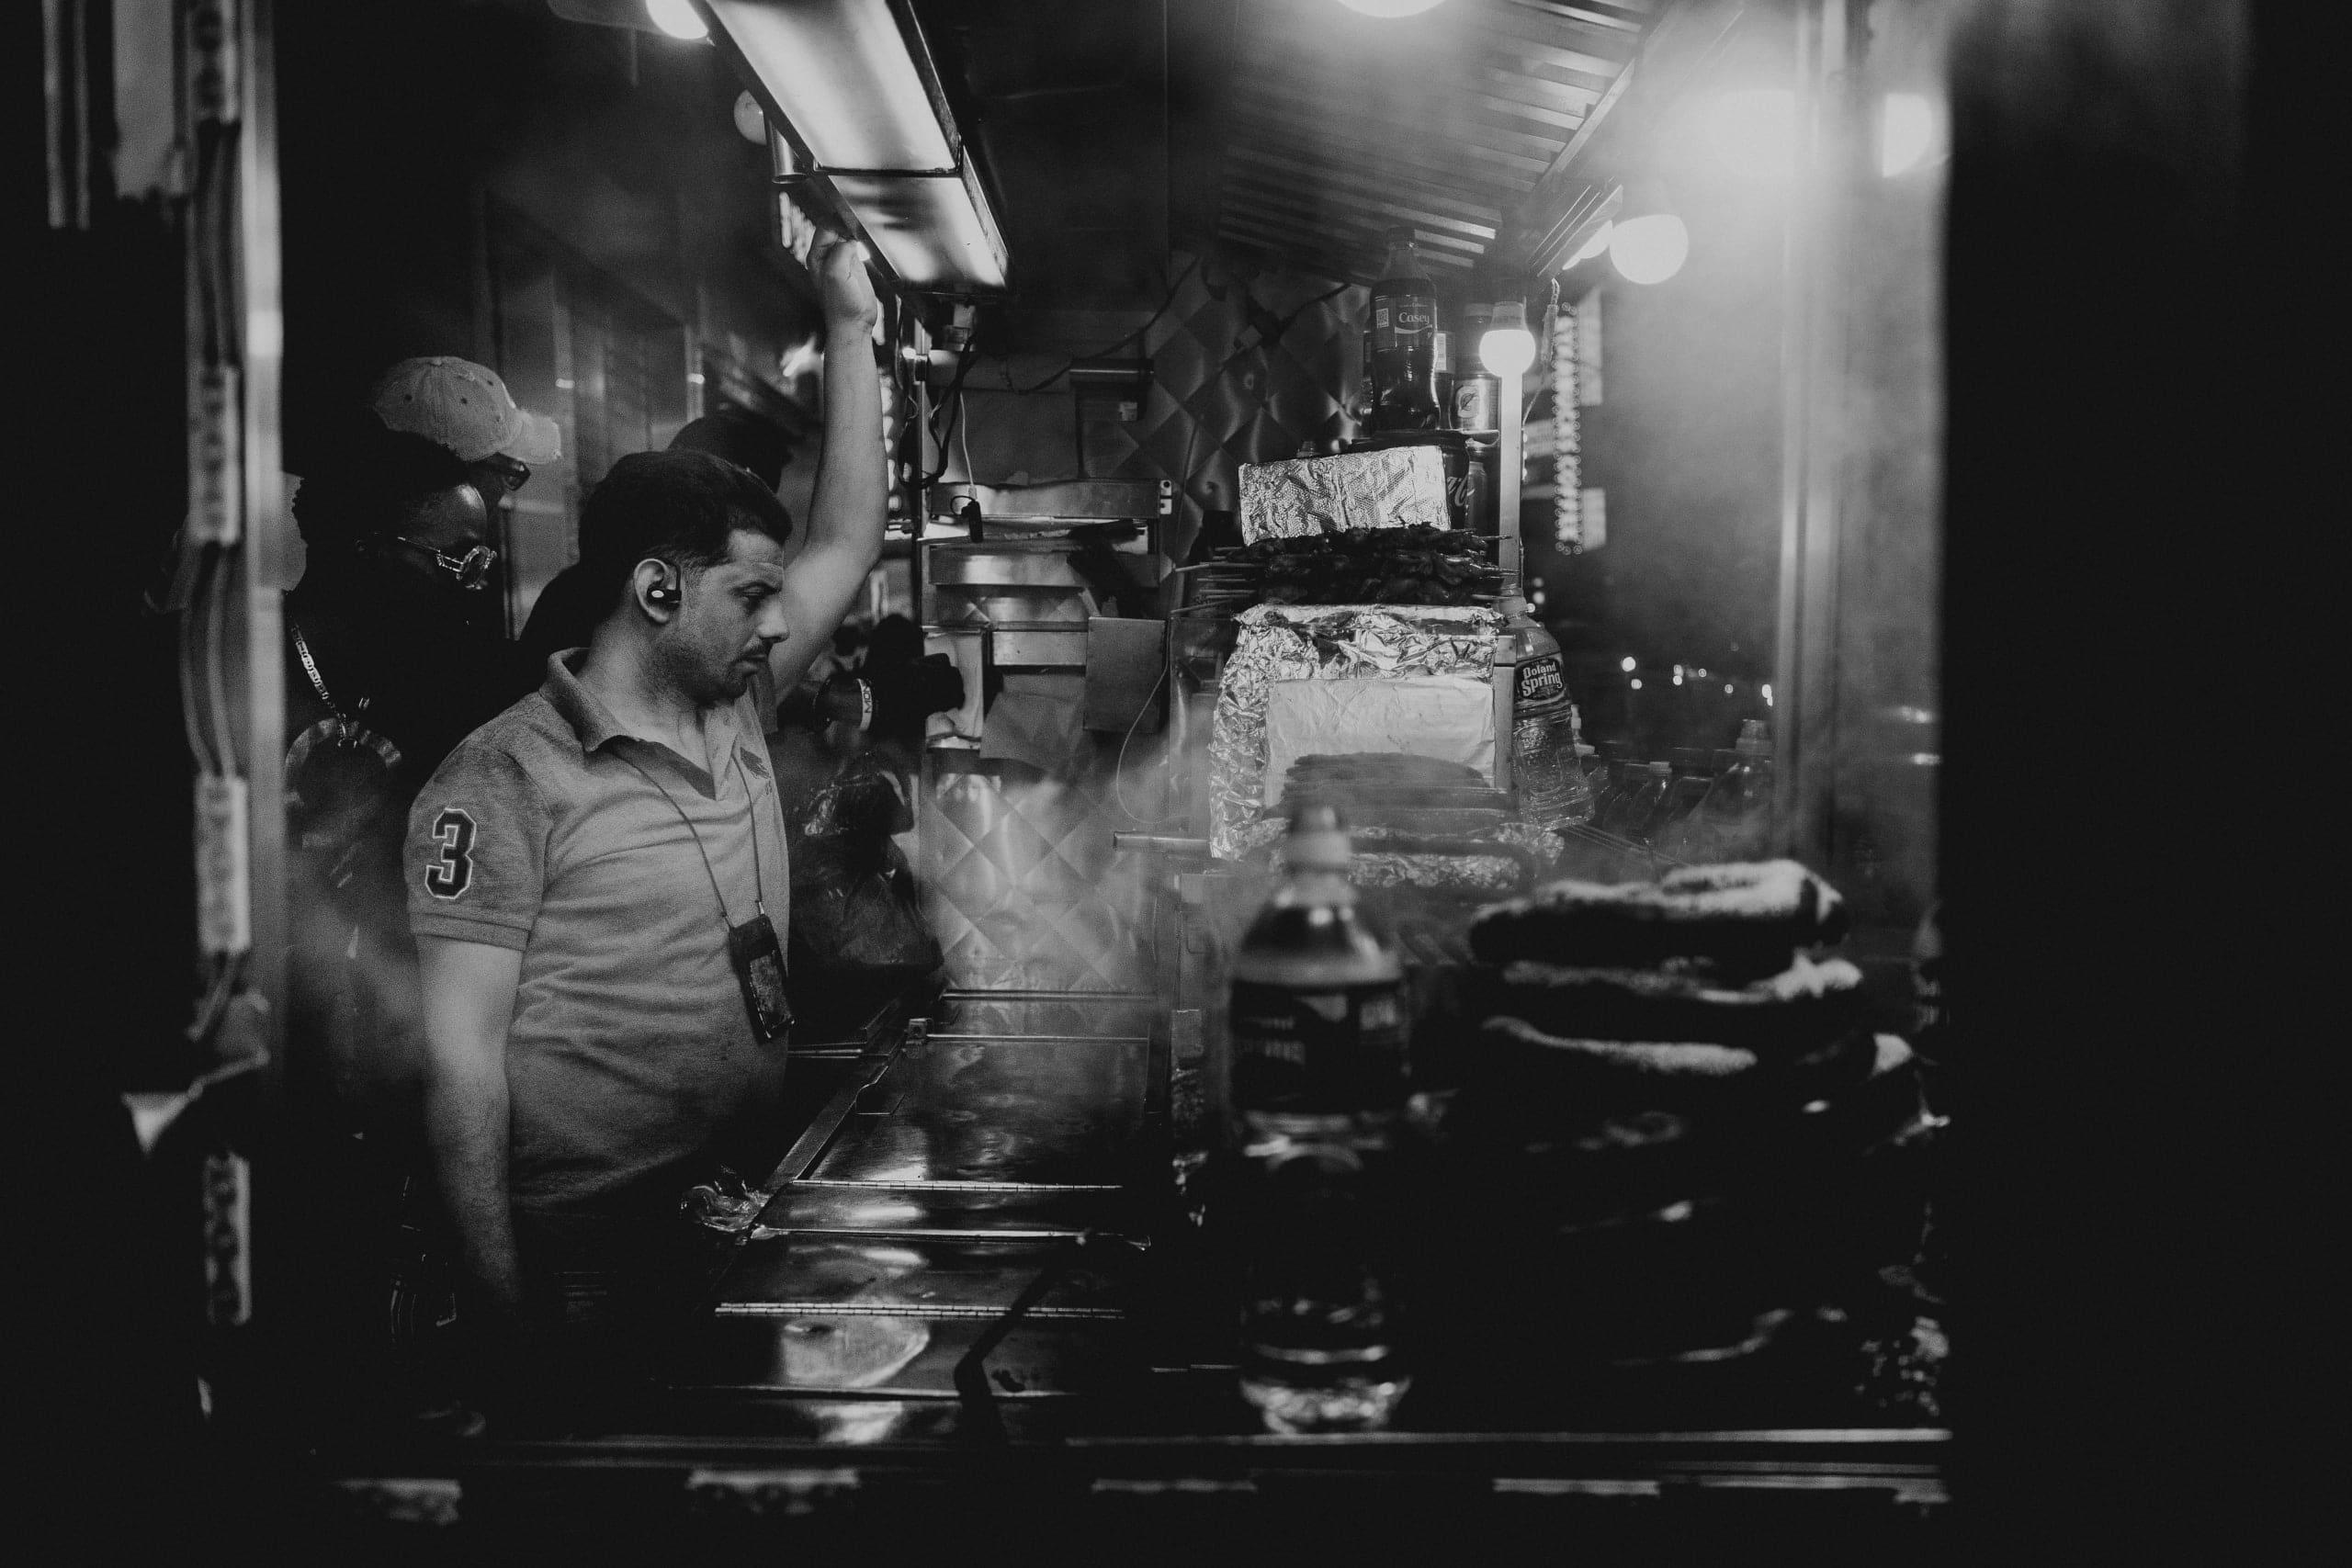 kitchen-ryan-loughlin-unsplash